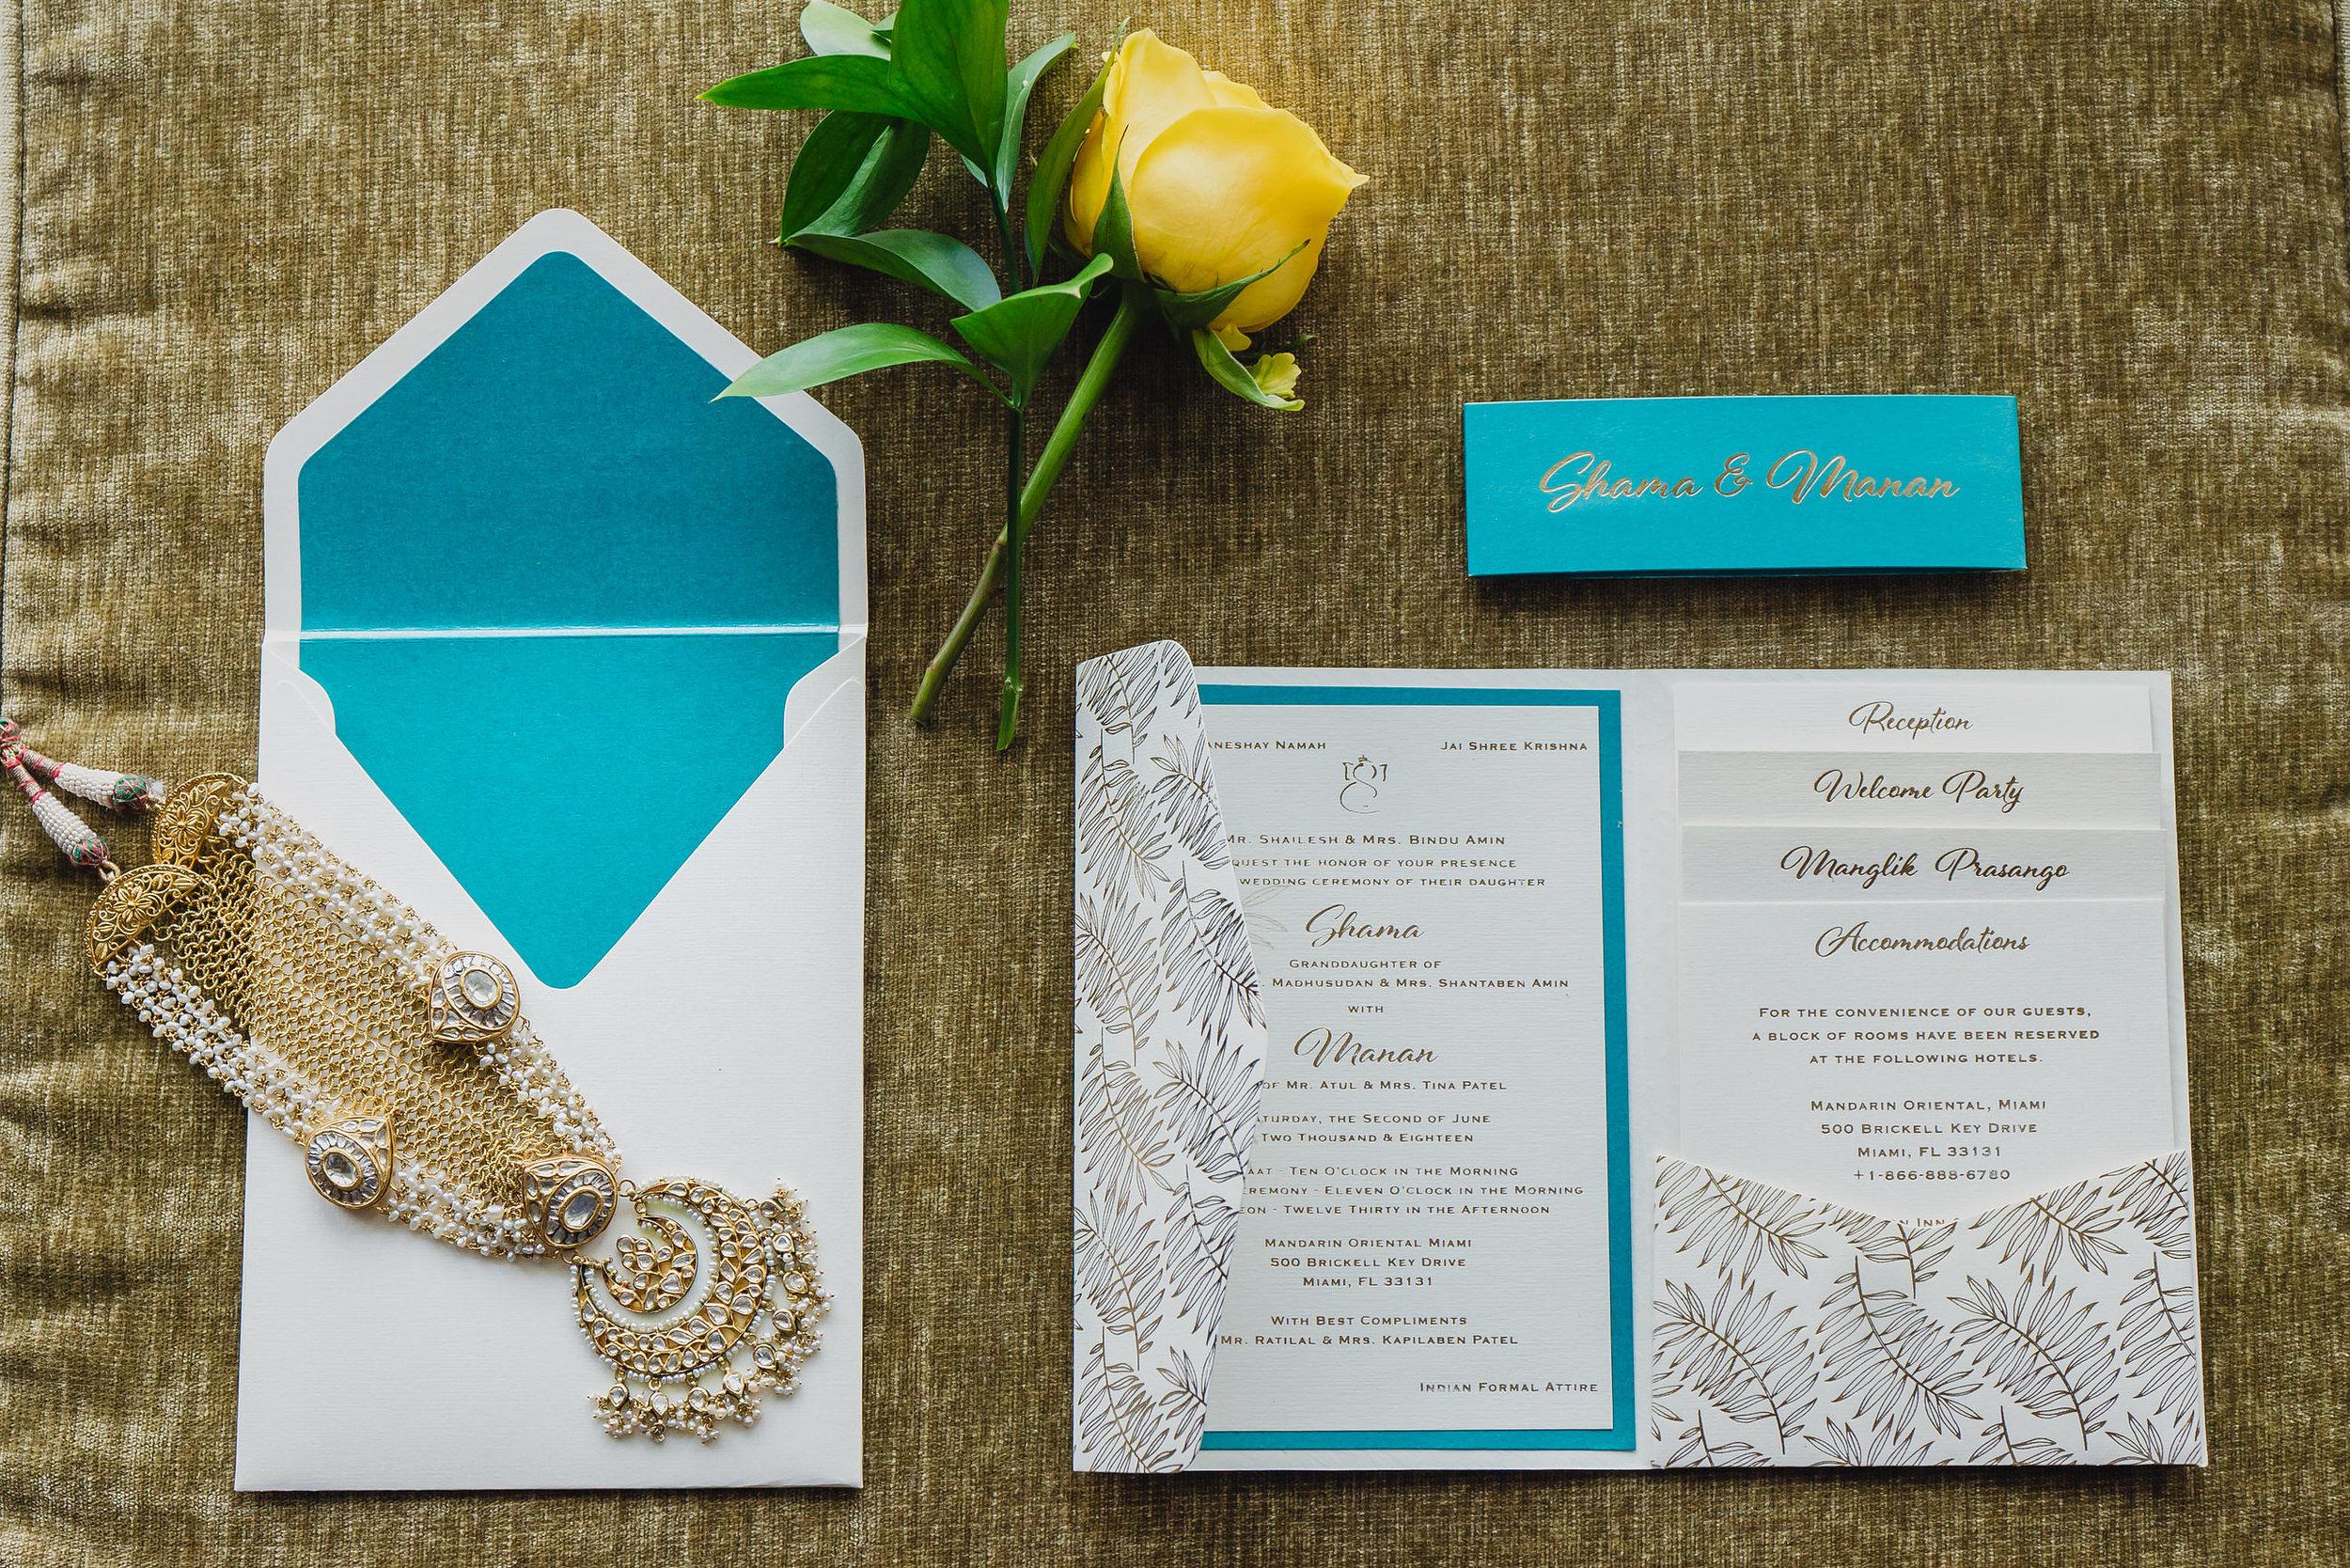 INDIAN WEDDING INVITATION.JPG